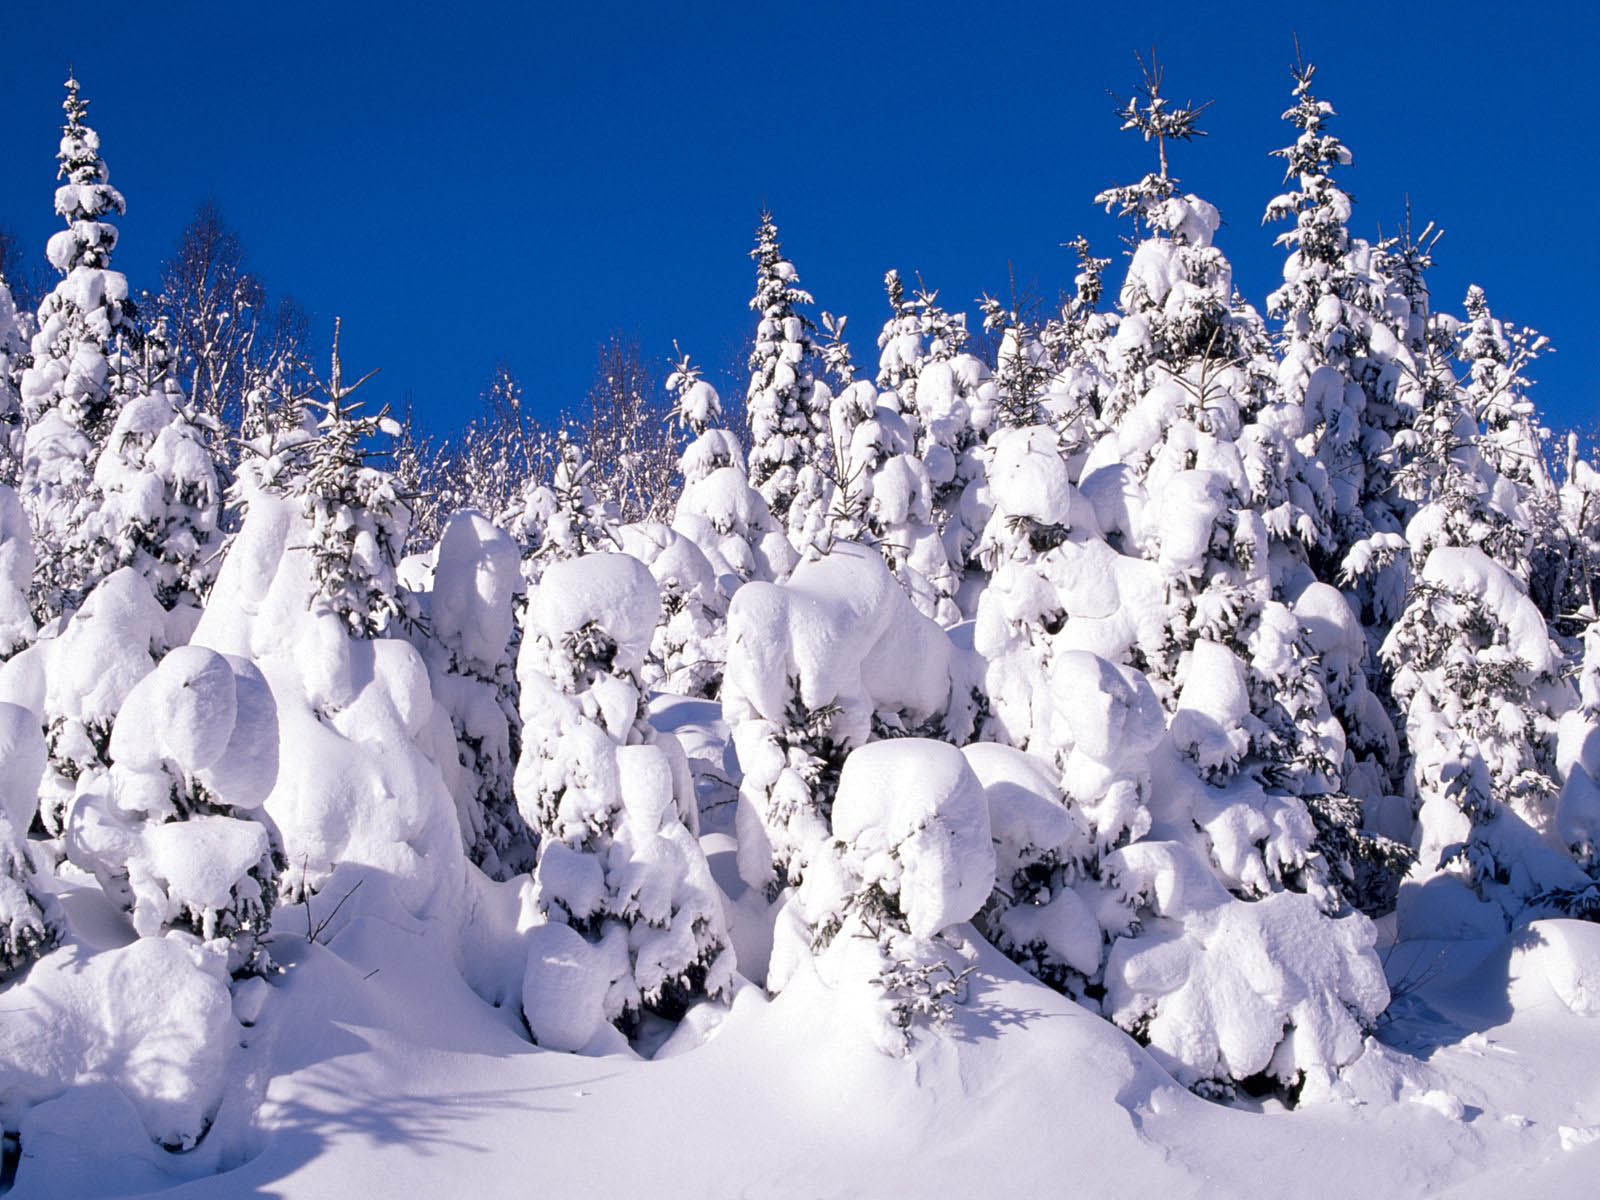 winter backgrounds desktop wallpaper